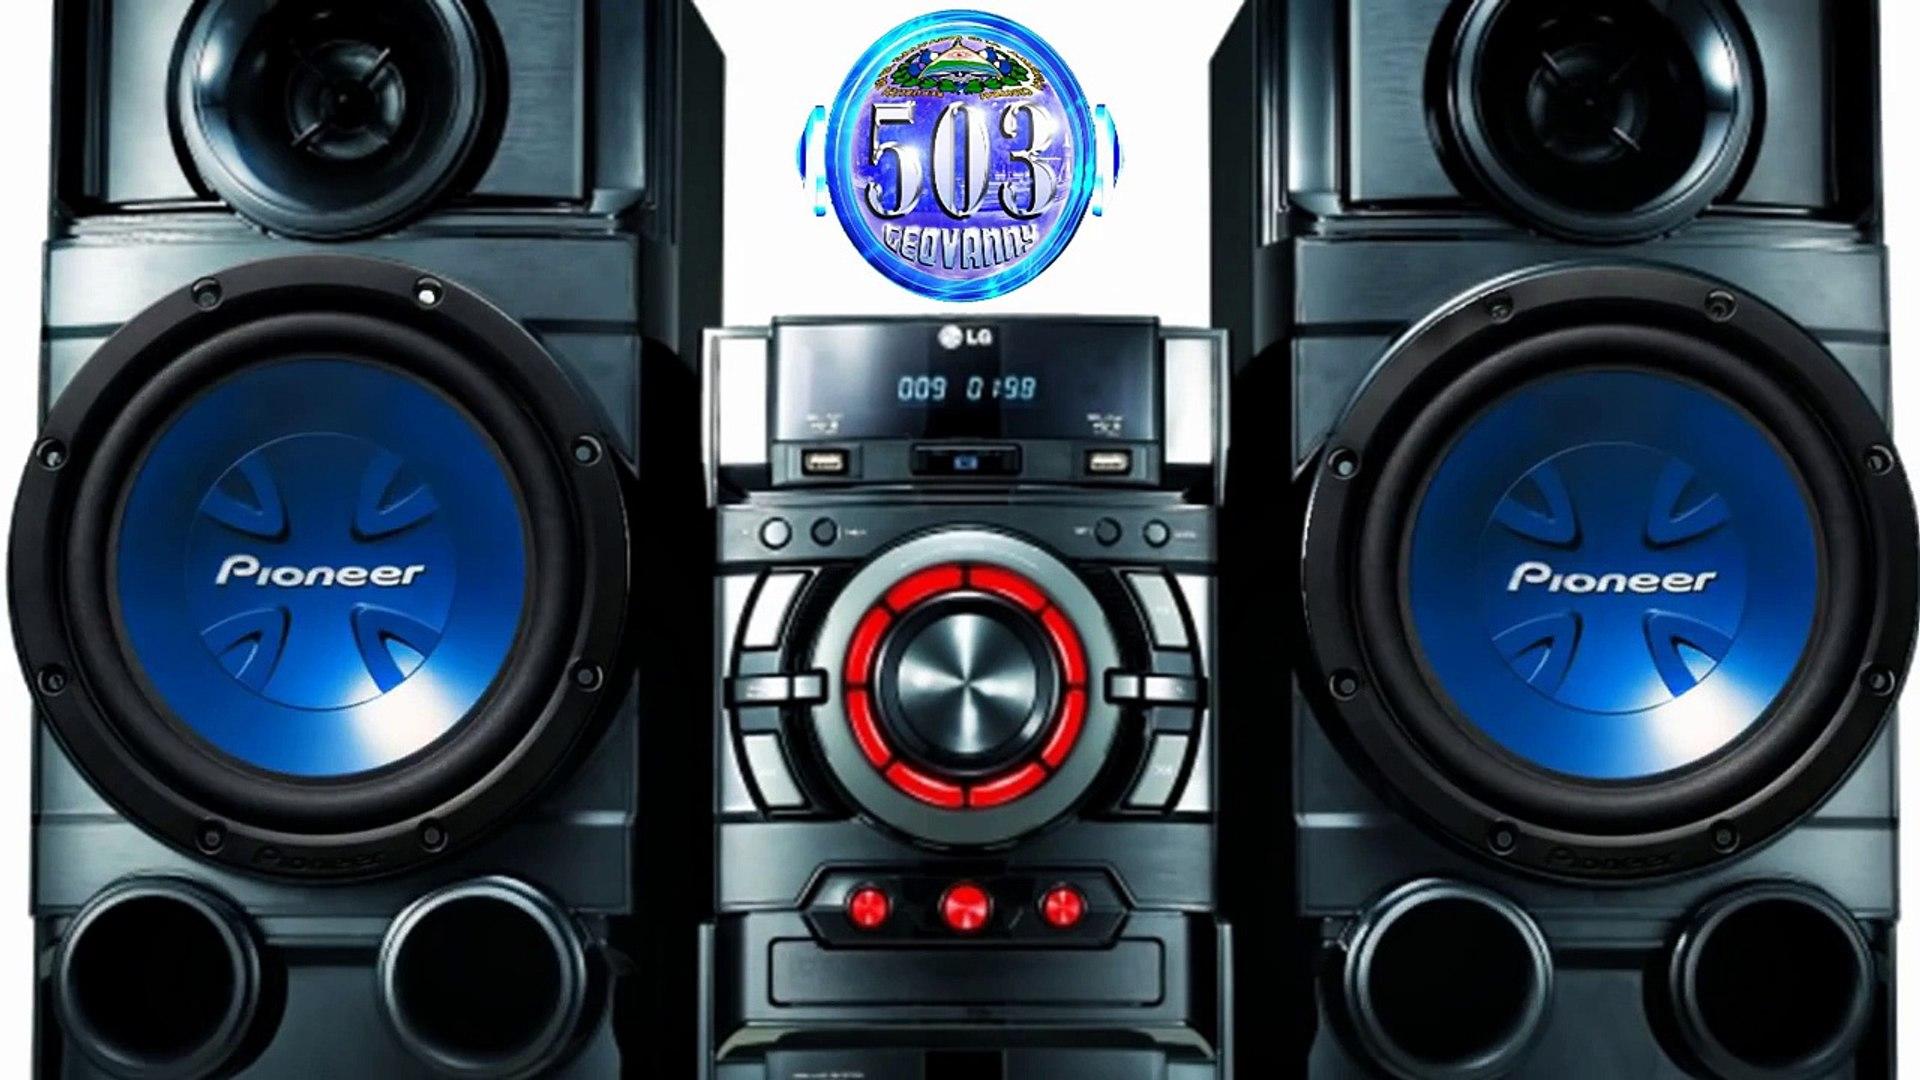 Extreme Bass ((((reggaeton))))